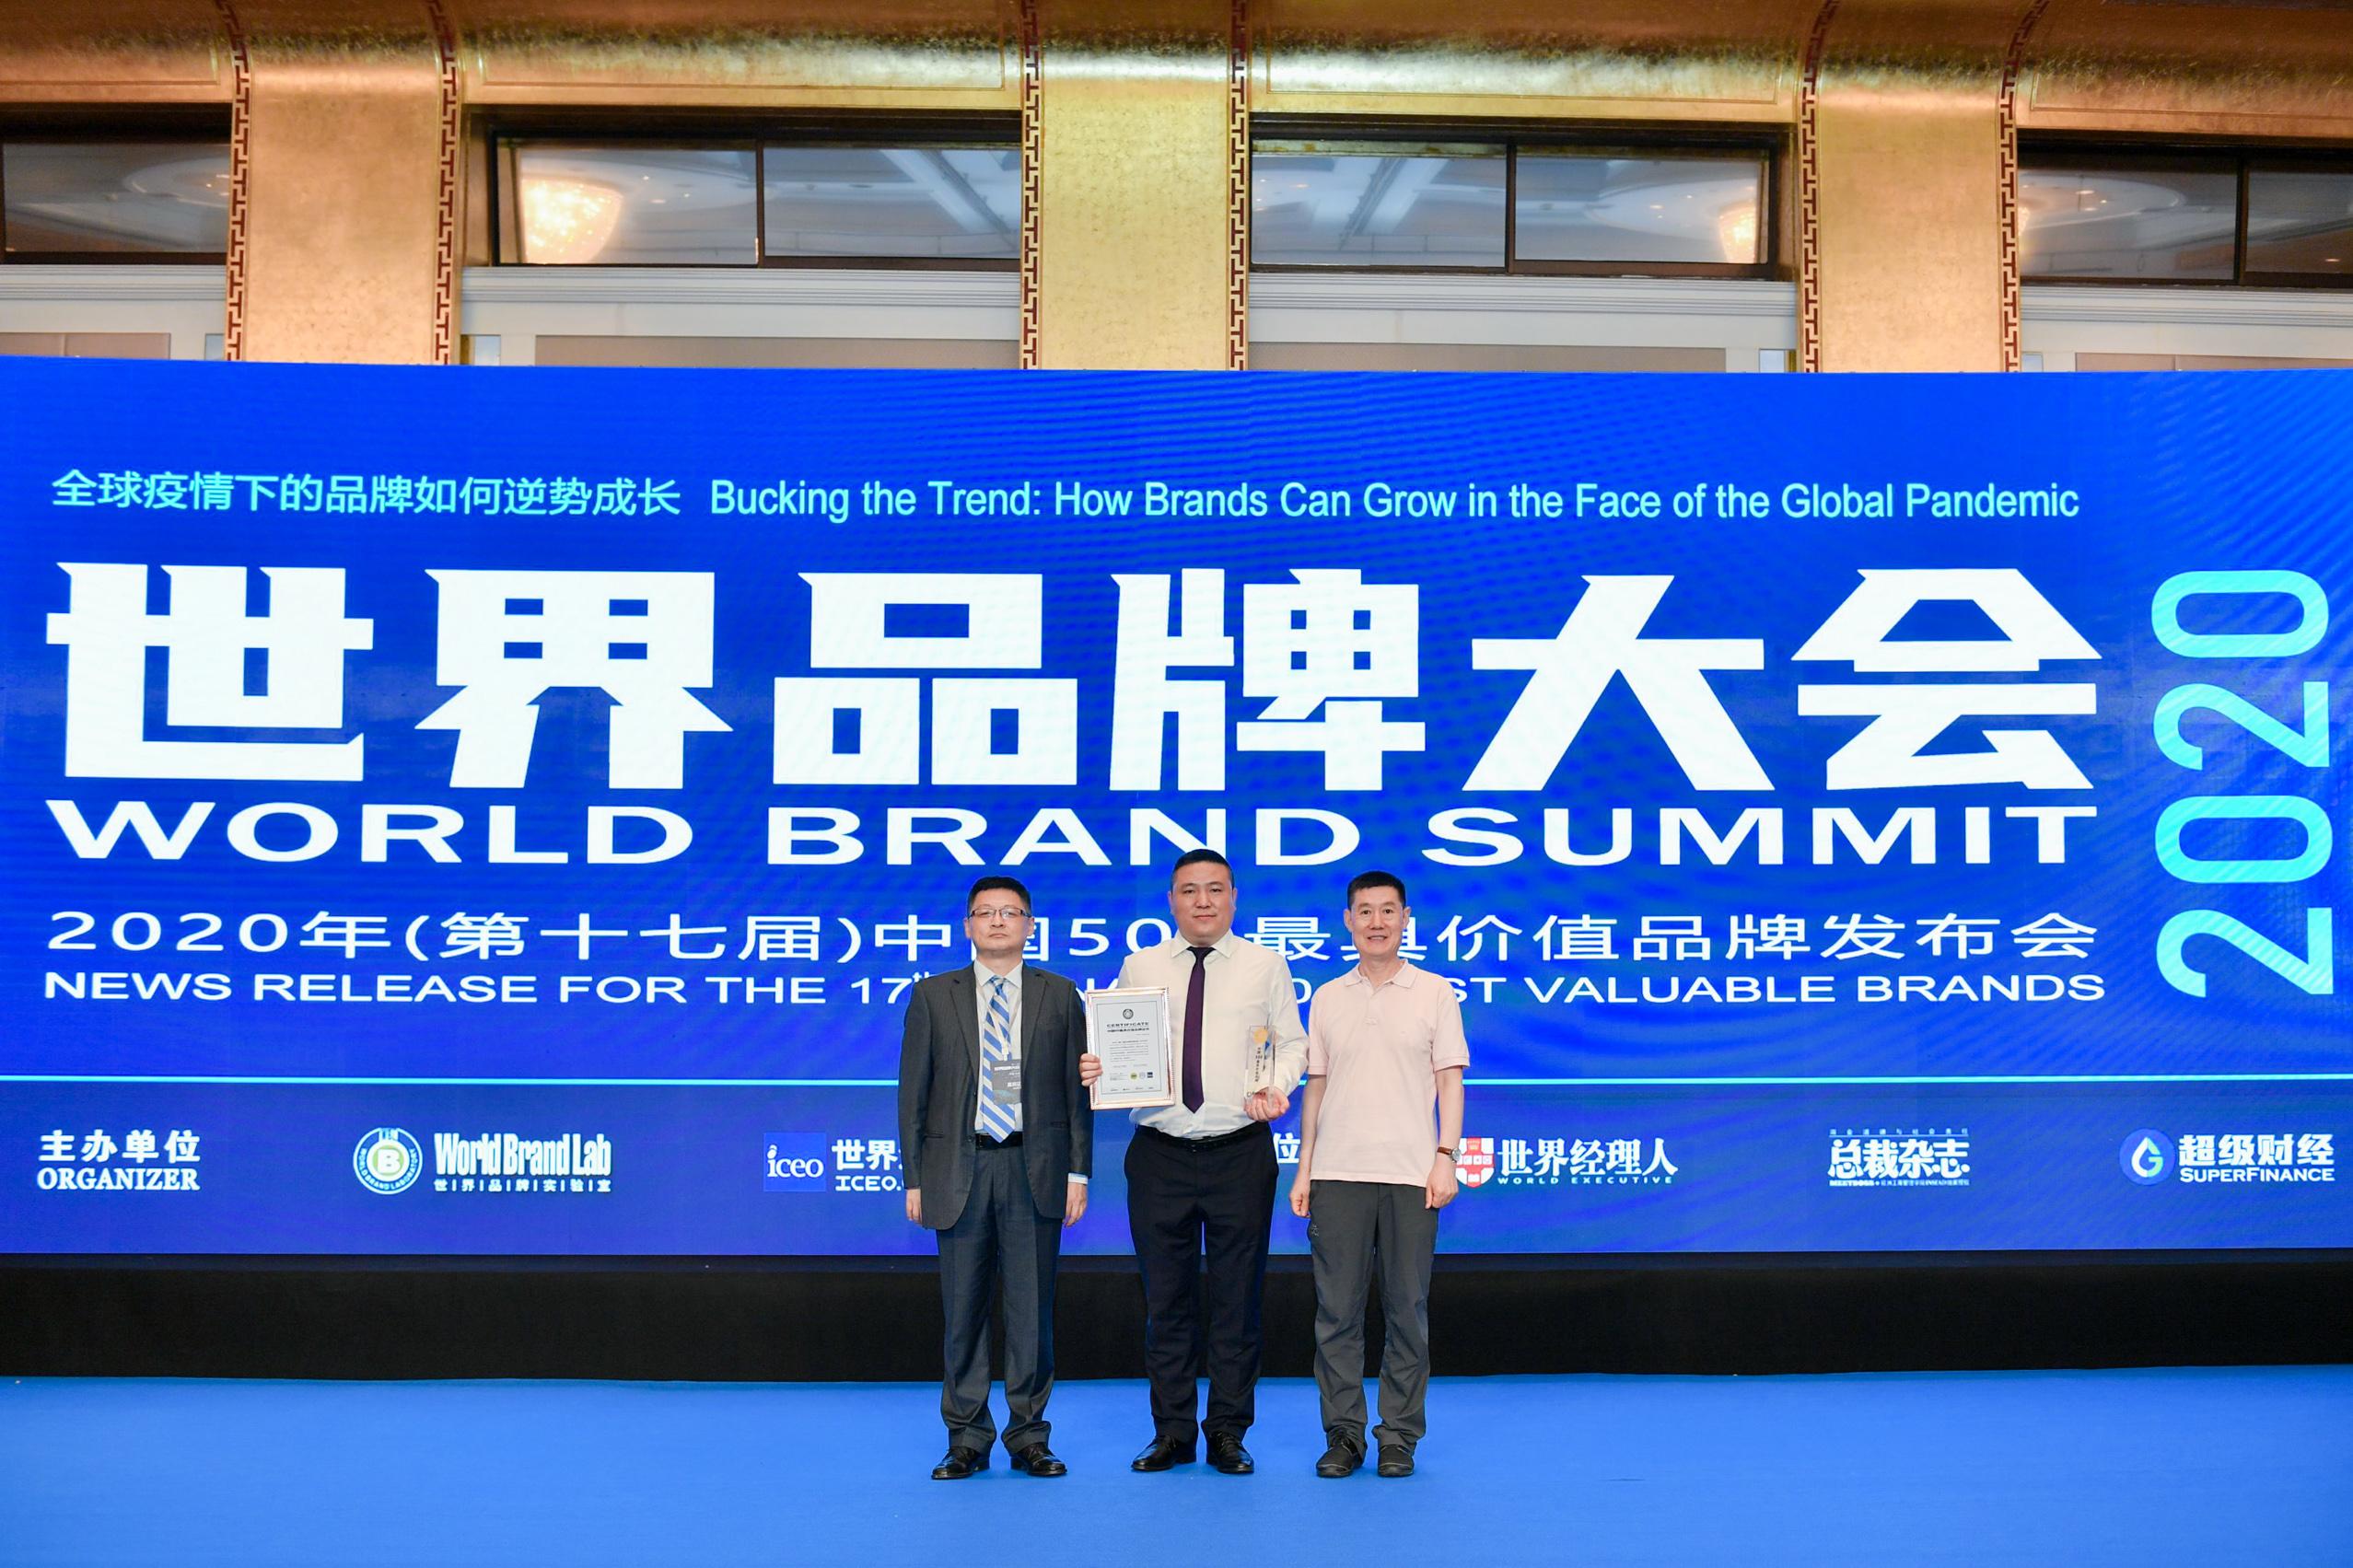 http://img.jiuzheng.com/news/s/5f/2b/5f2bbf398f1e037d458b4581.jpg